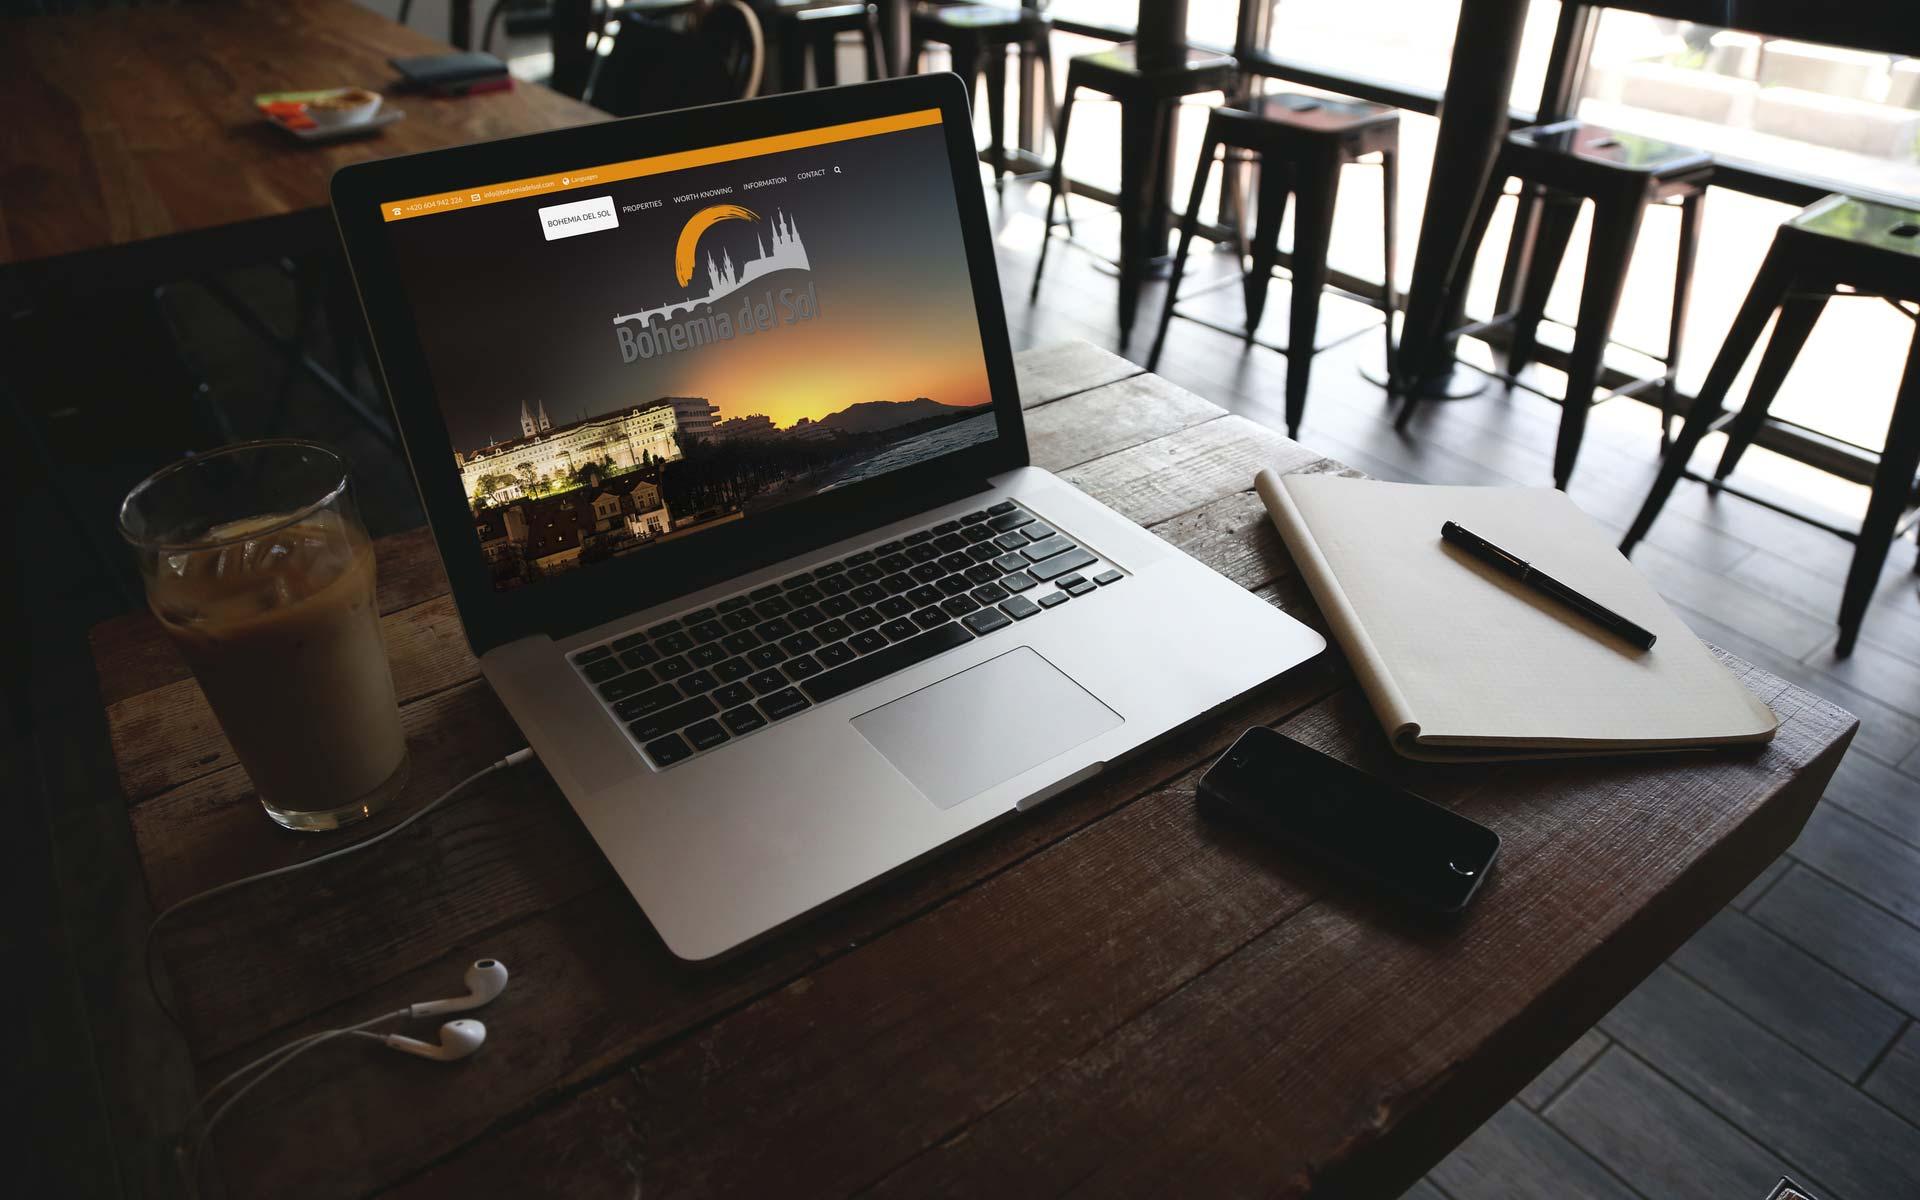 Referenz Webdesign | Bohemia del Sol